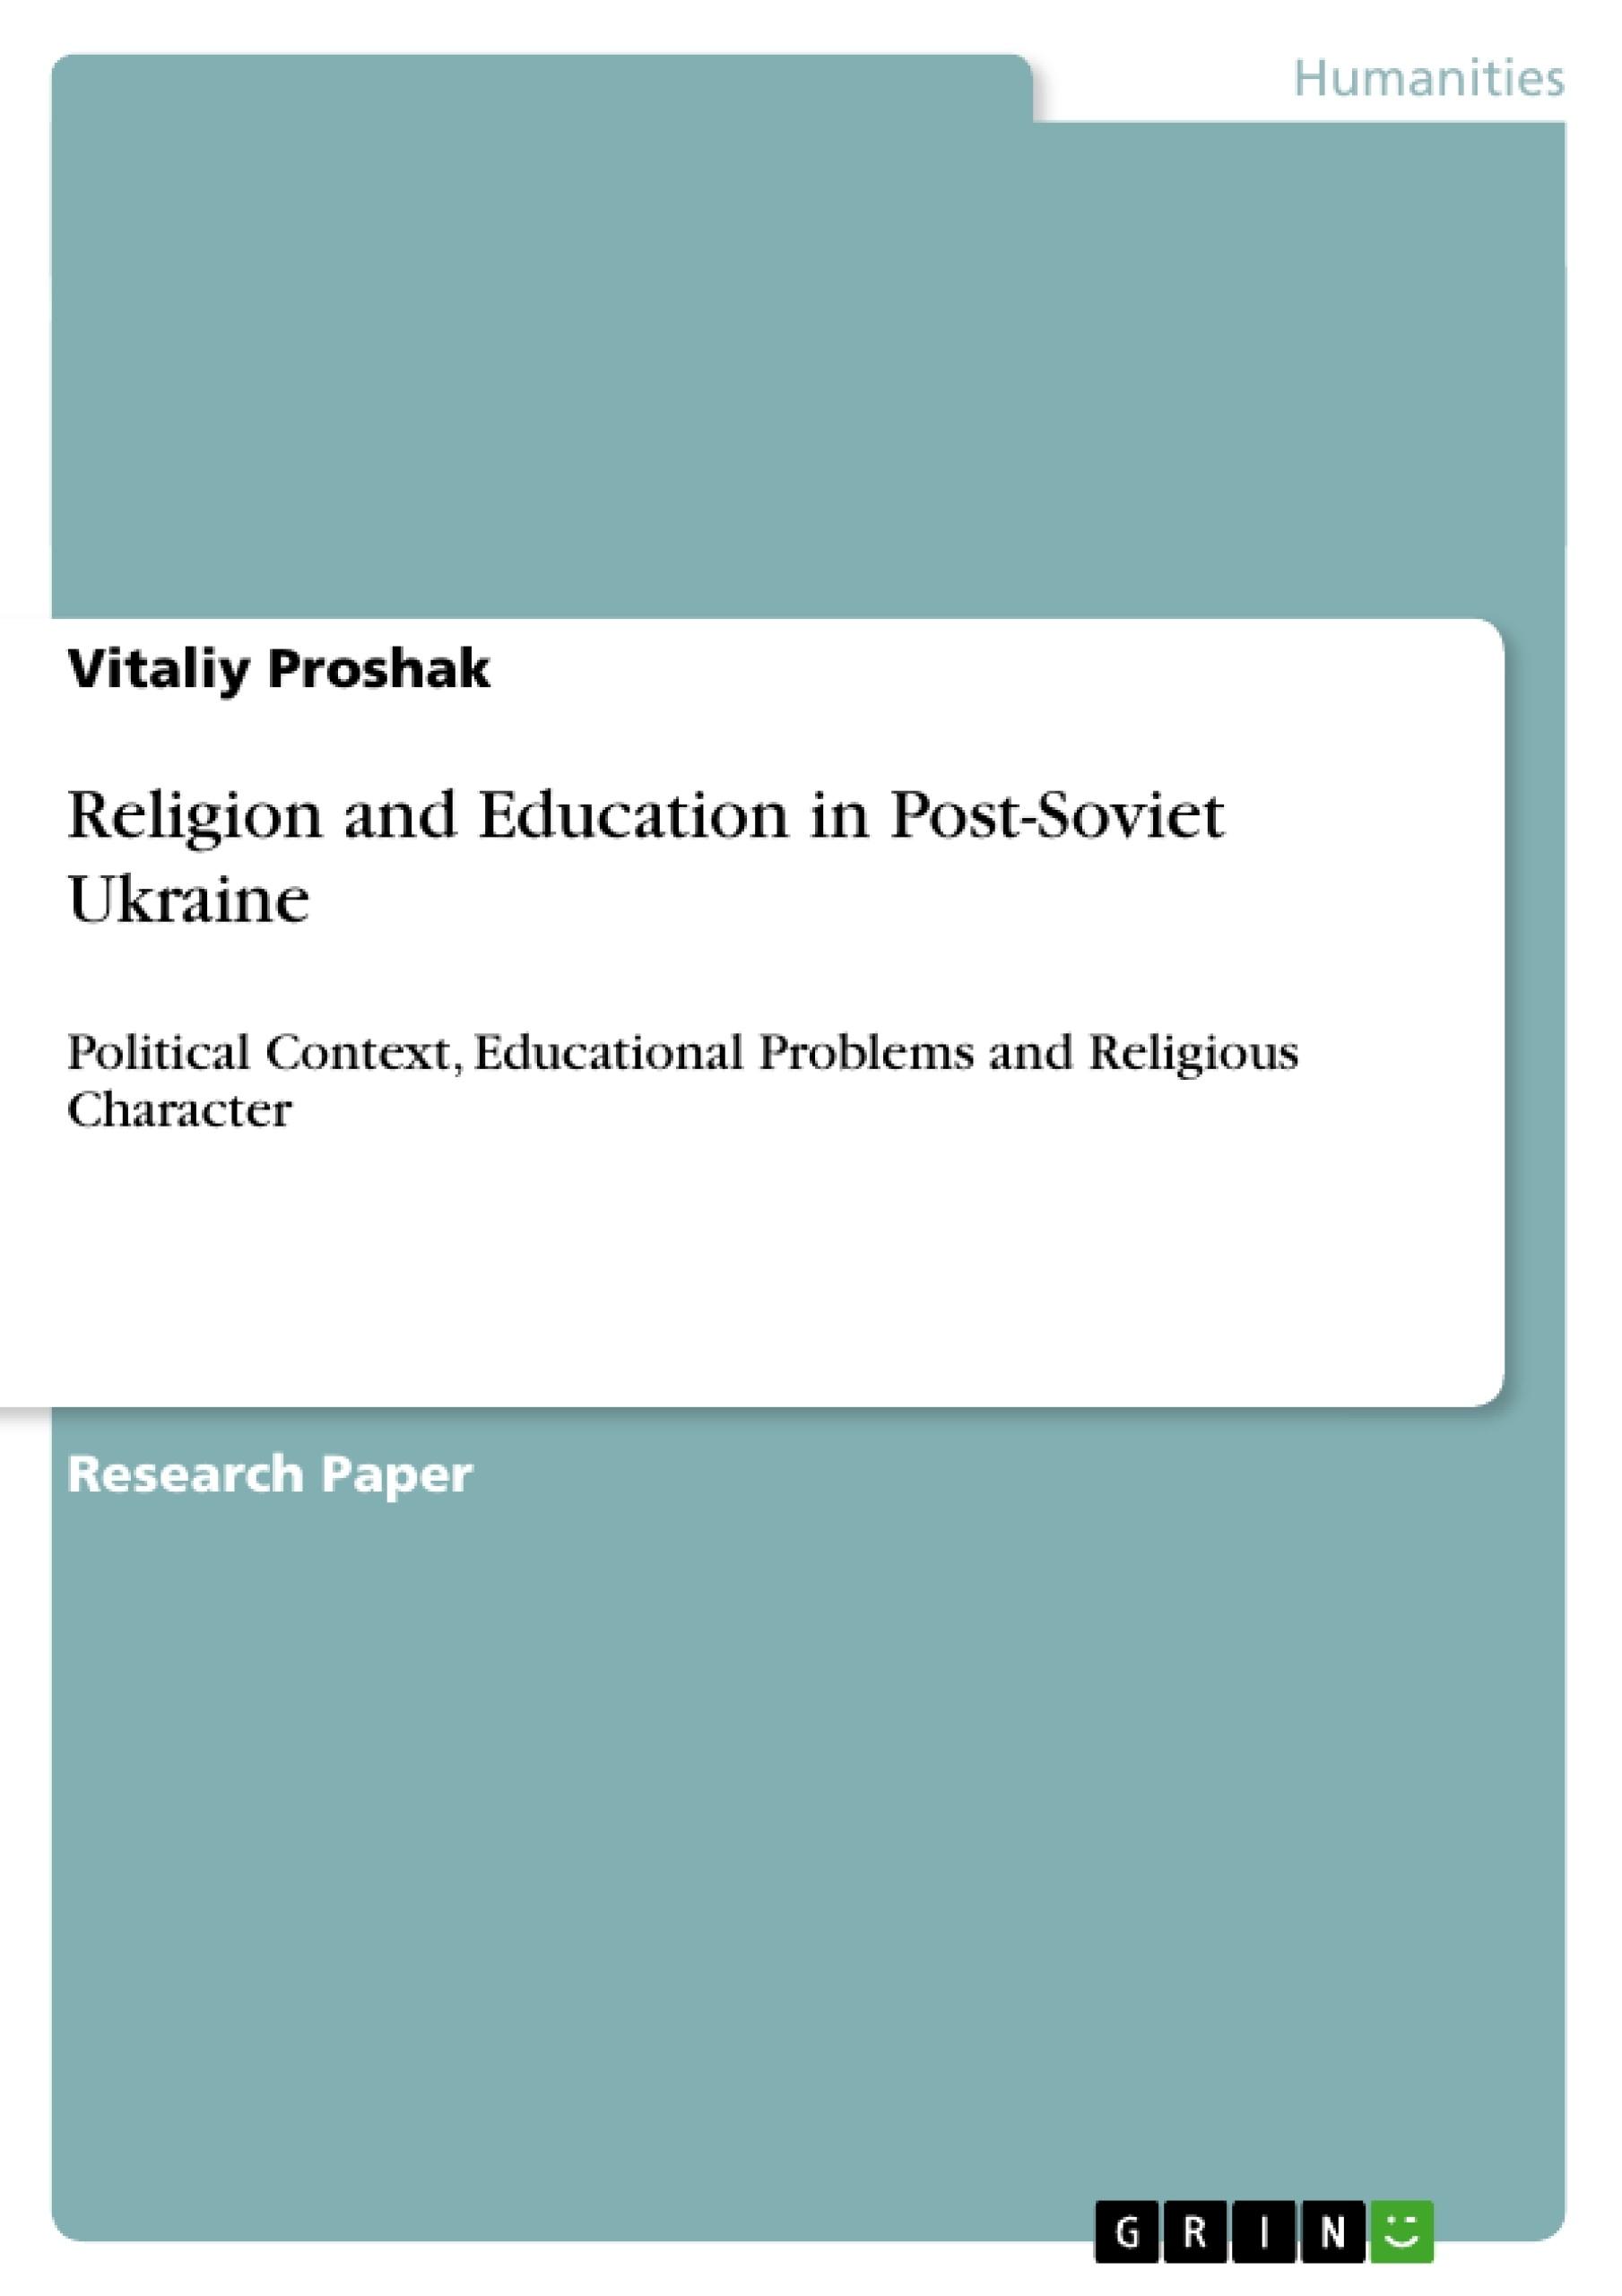 Title: Religion and Education in Post-Soviet Ukraine